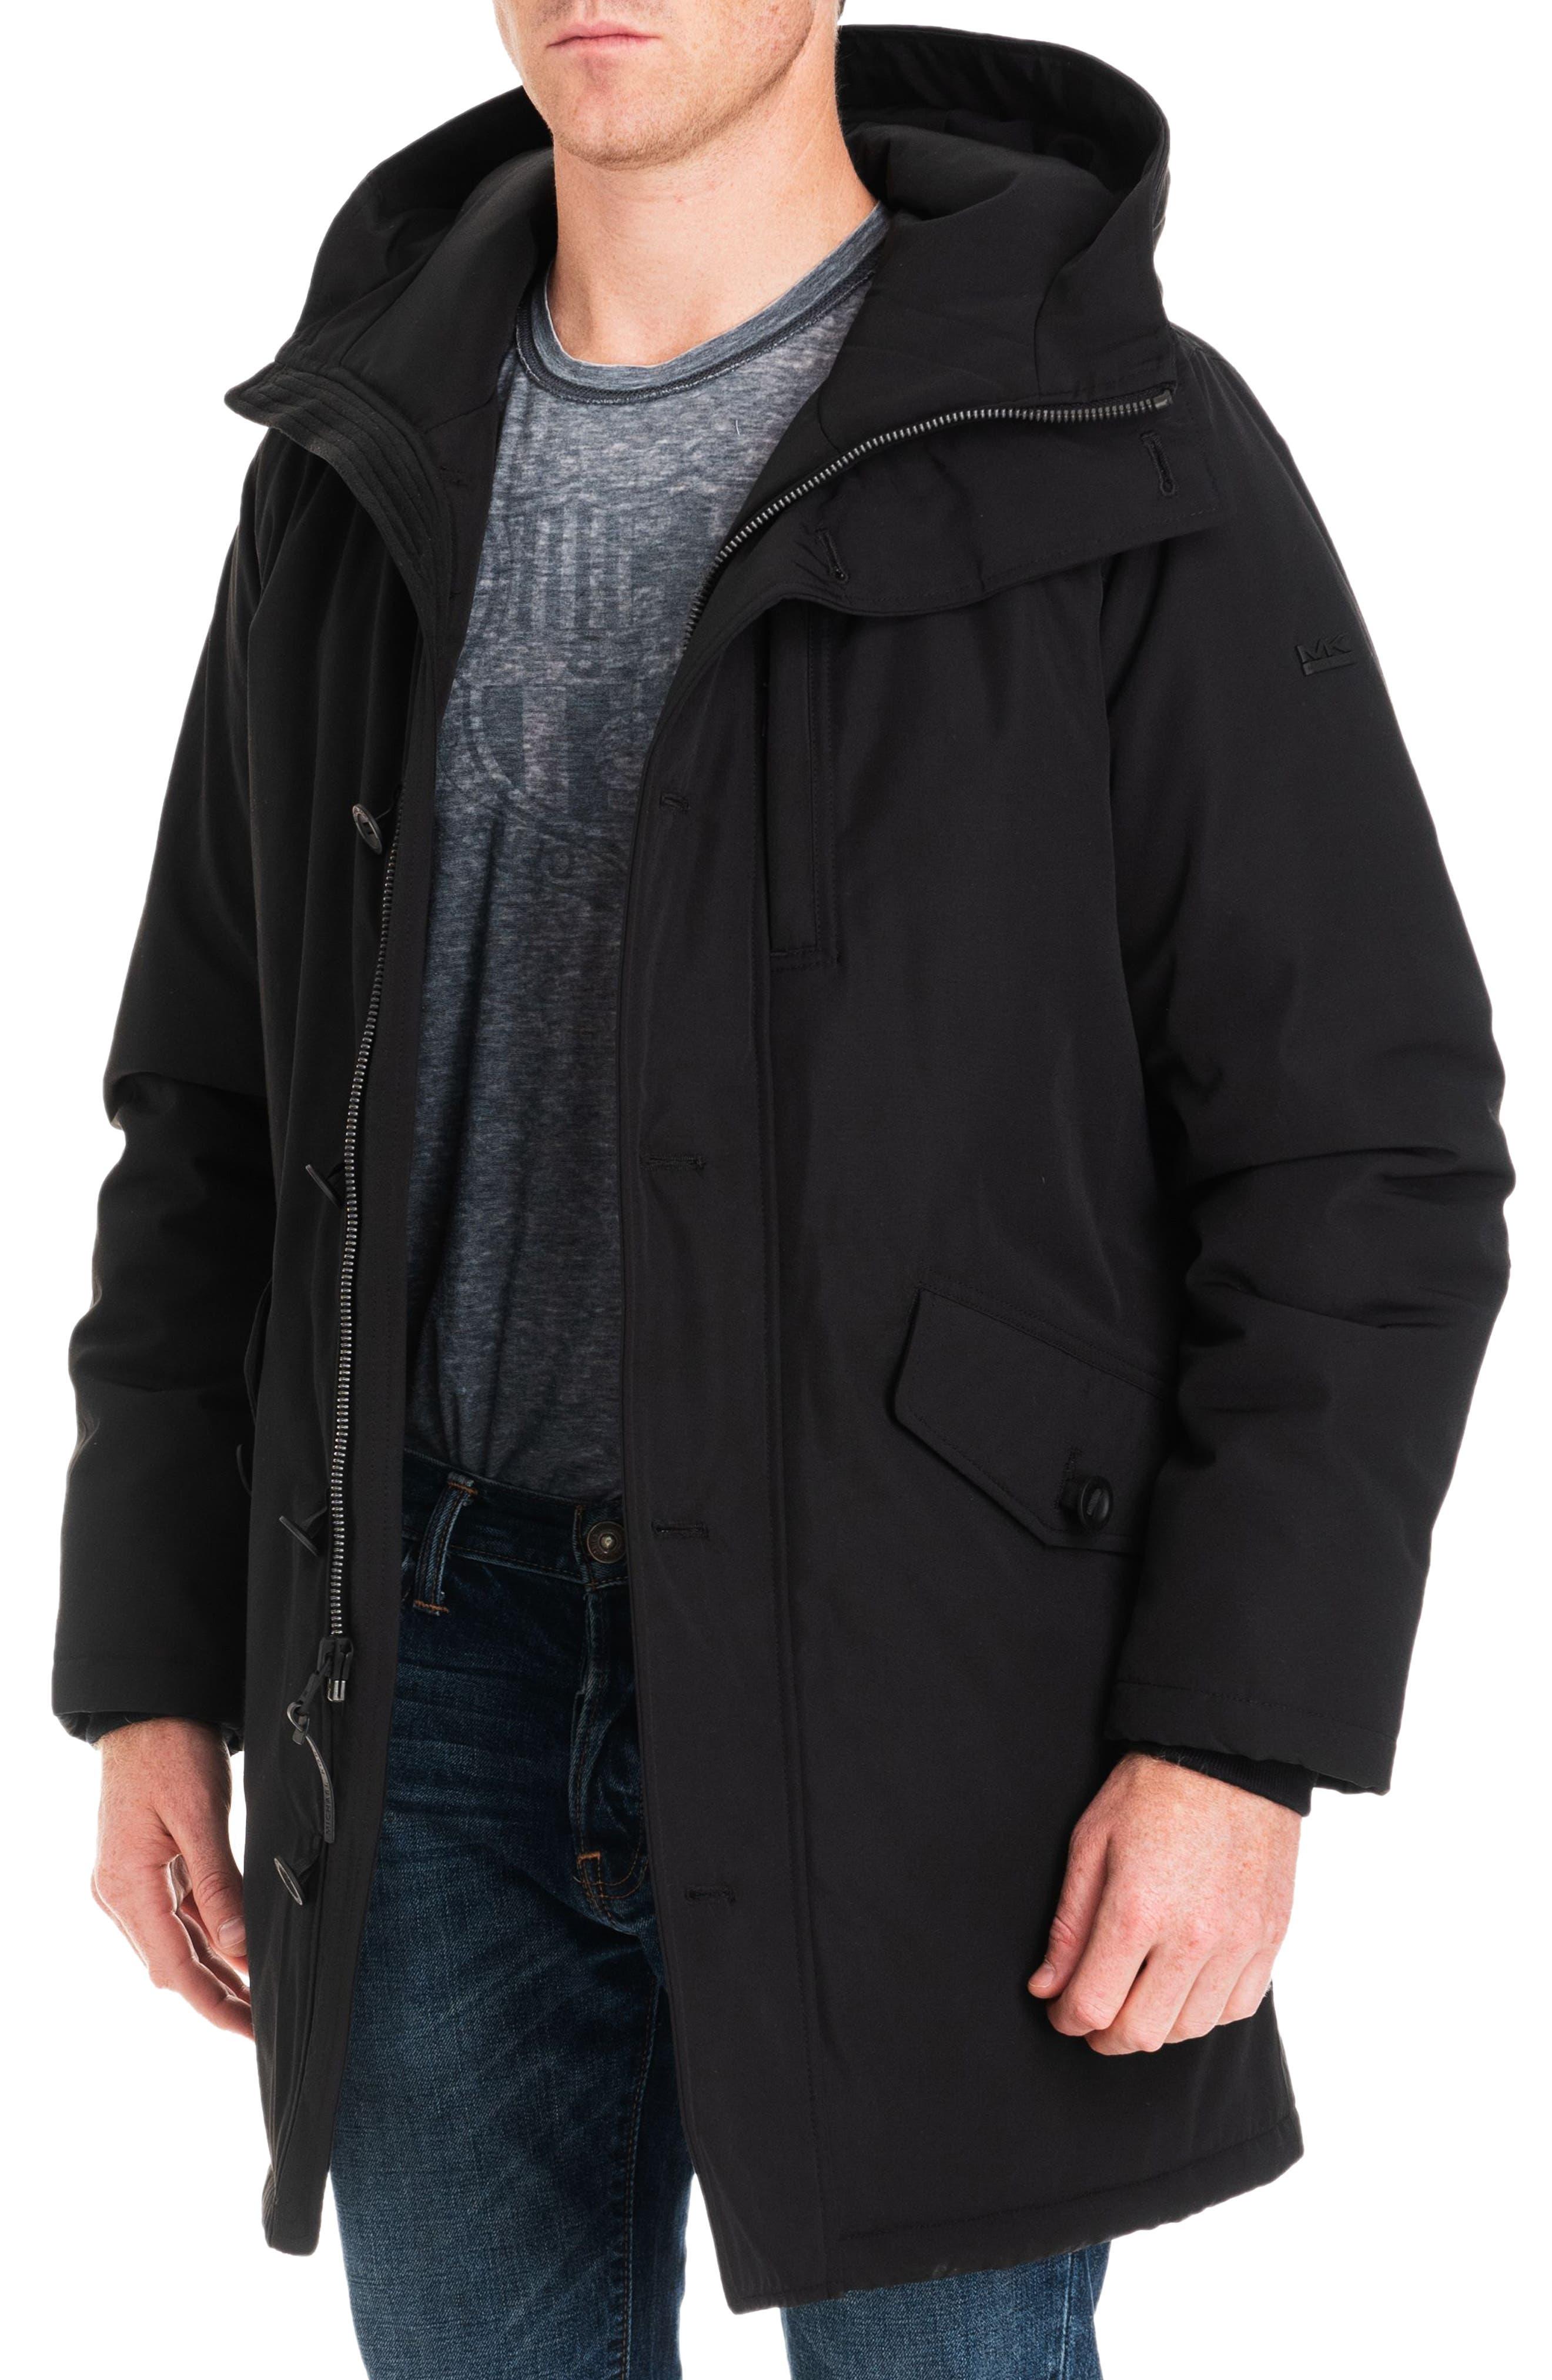 Gardiner Water Resistant Snorkel Coat,                             Alternate thumbnail 5, color,                             BLACK/ MIDNIGHT